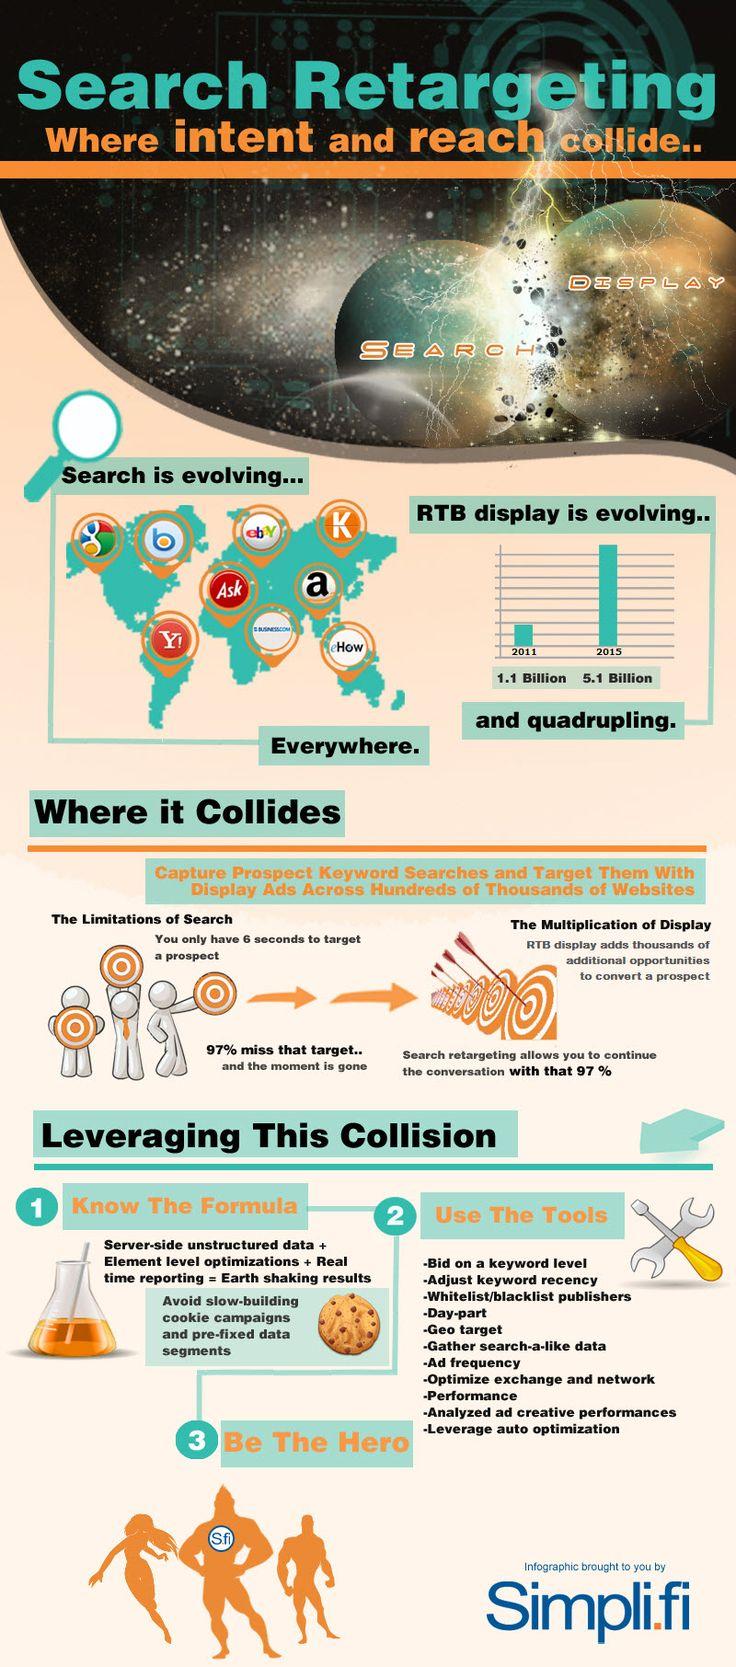 Advertising-Infographics-Search-Retargeting-Where-Intent-Search-Collide Advertising Infographics : Search Retargeting - Where Intent & Search Collide